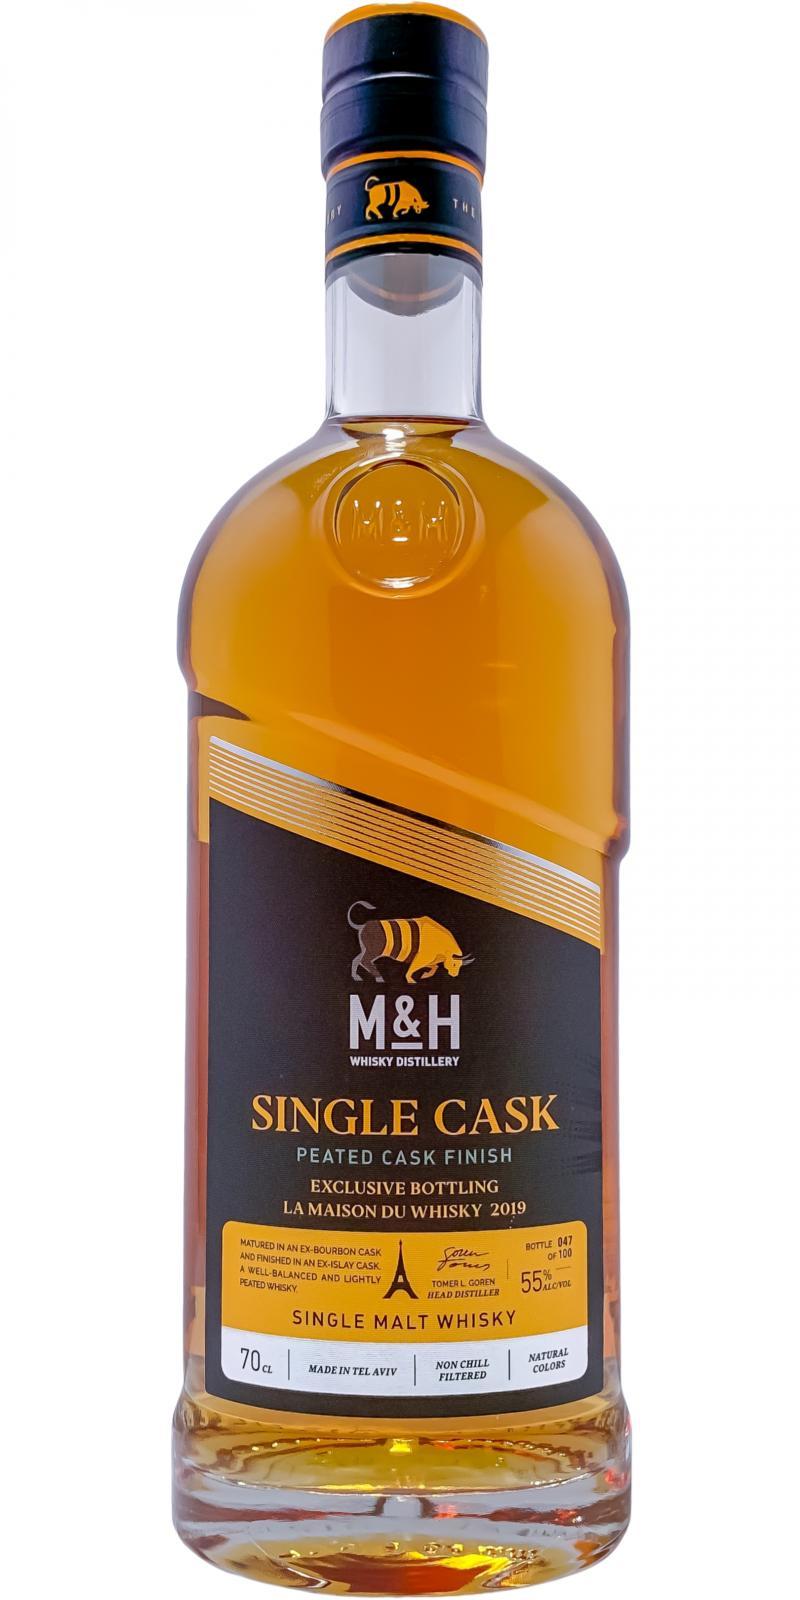 Milk & Honey La Maison du Whisky 2019